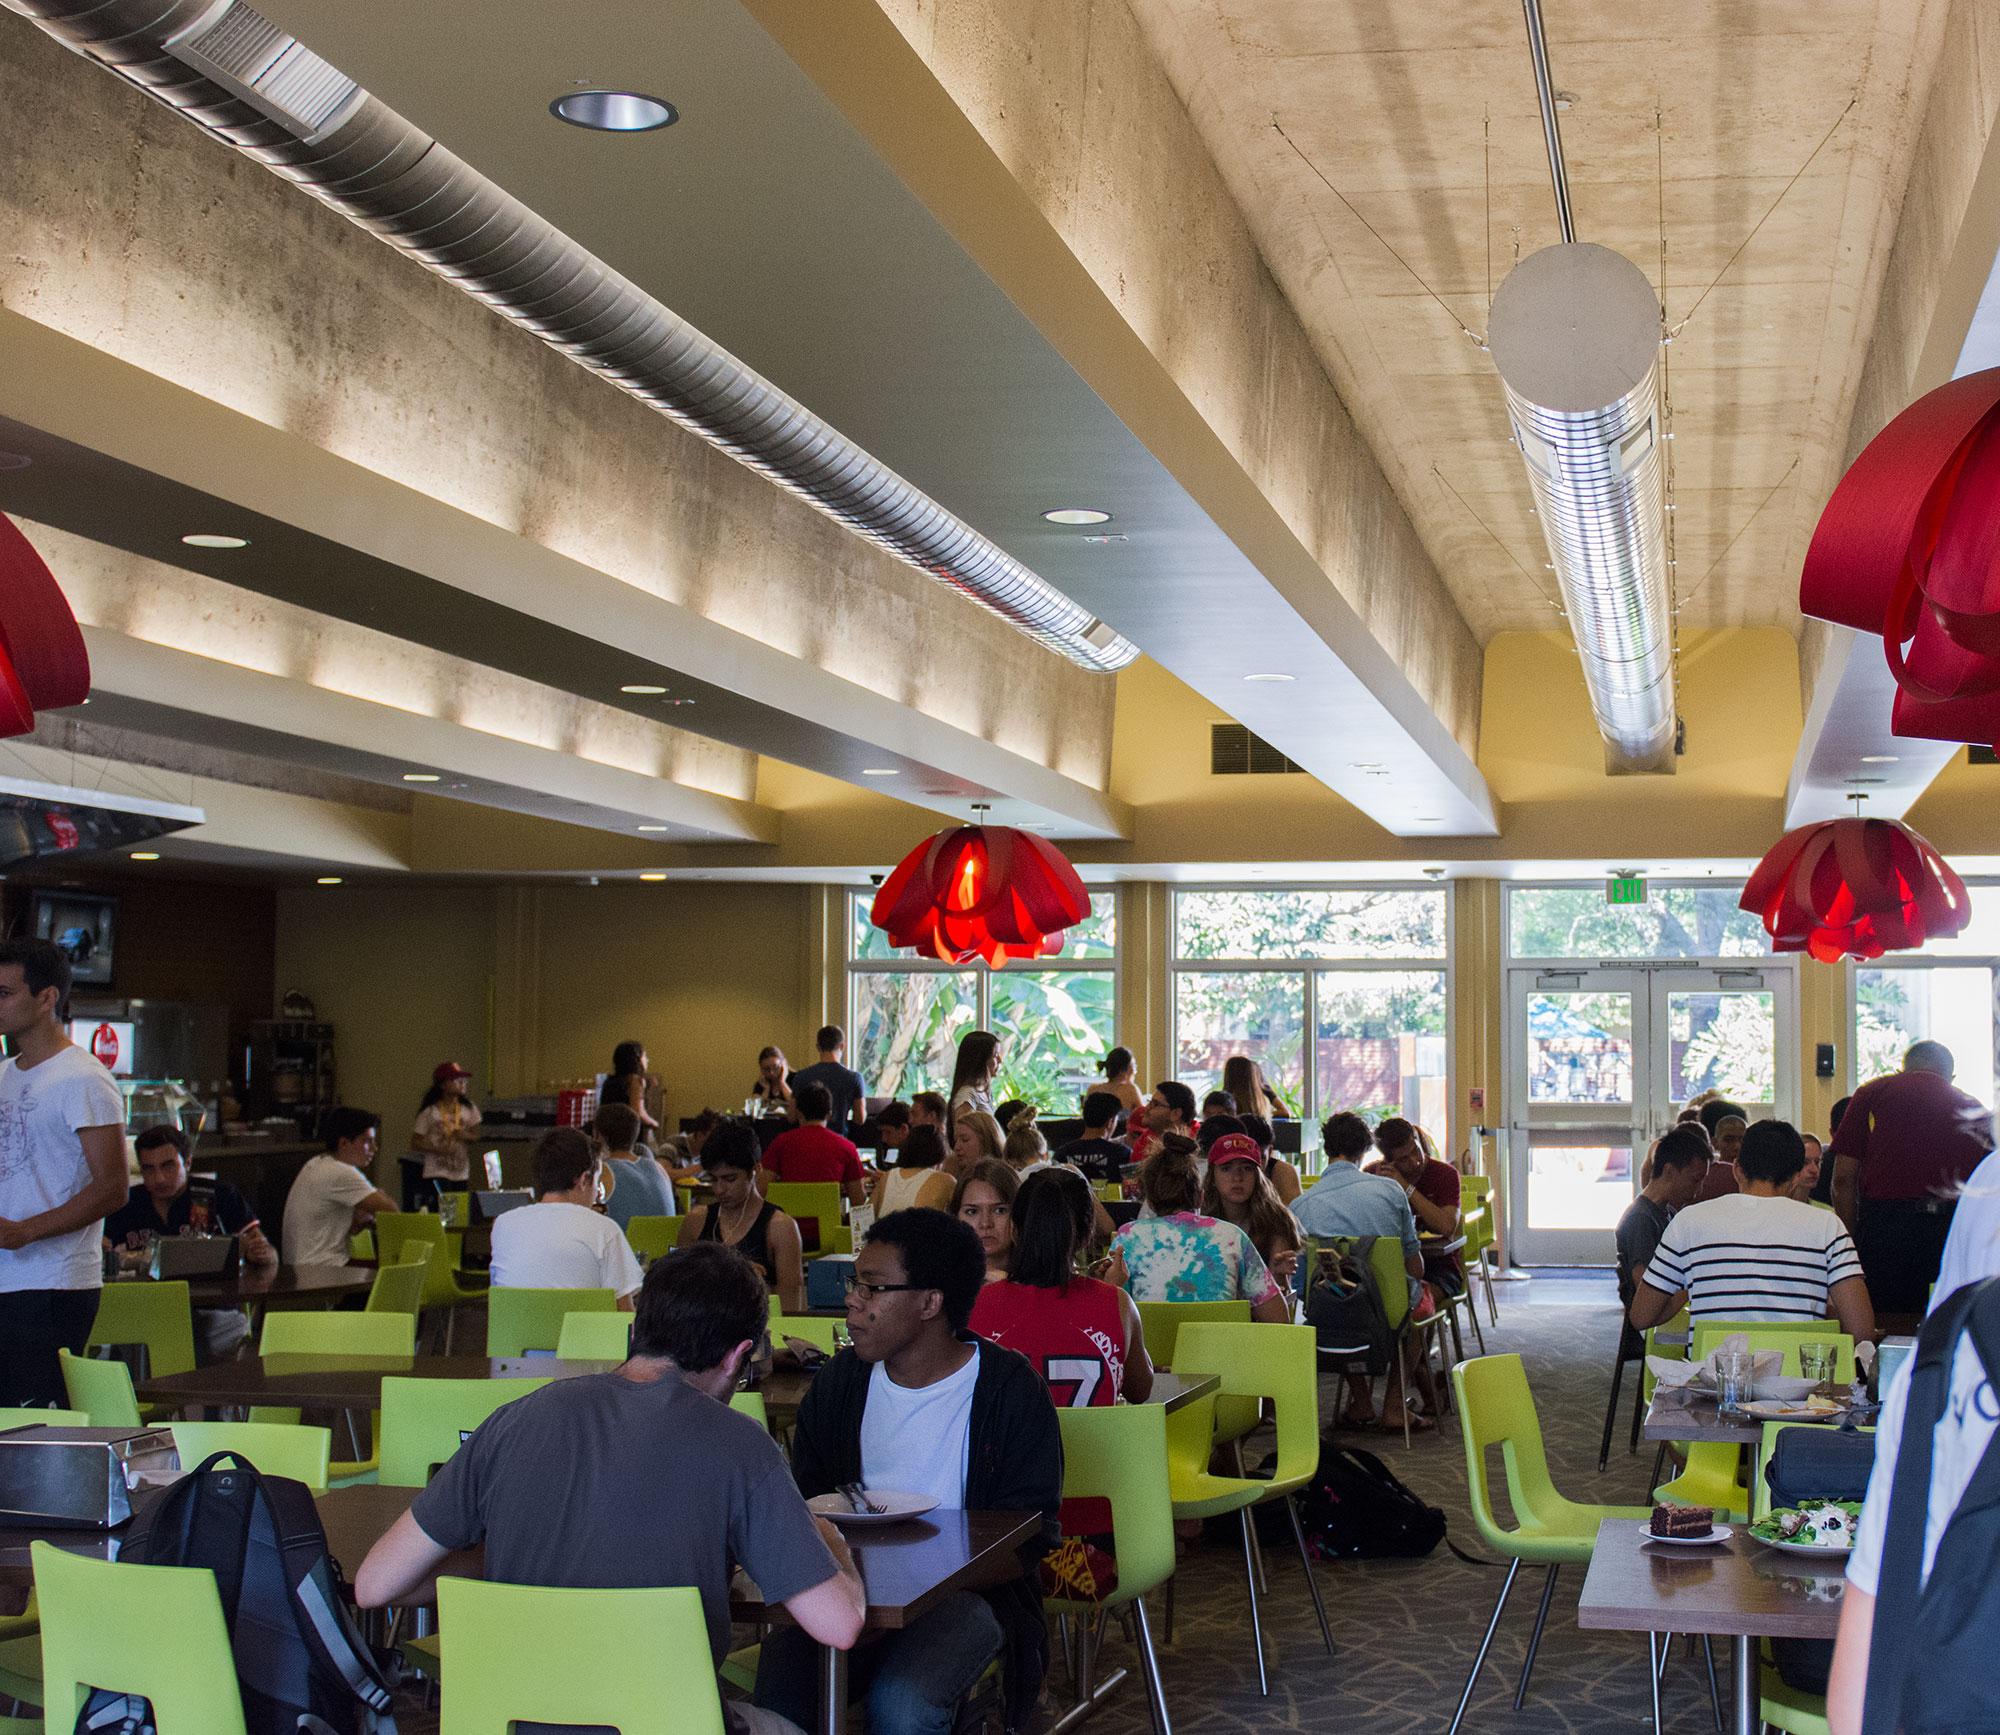 Dining Hall: Dining Hall Will Offer Kosher Meals